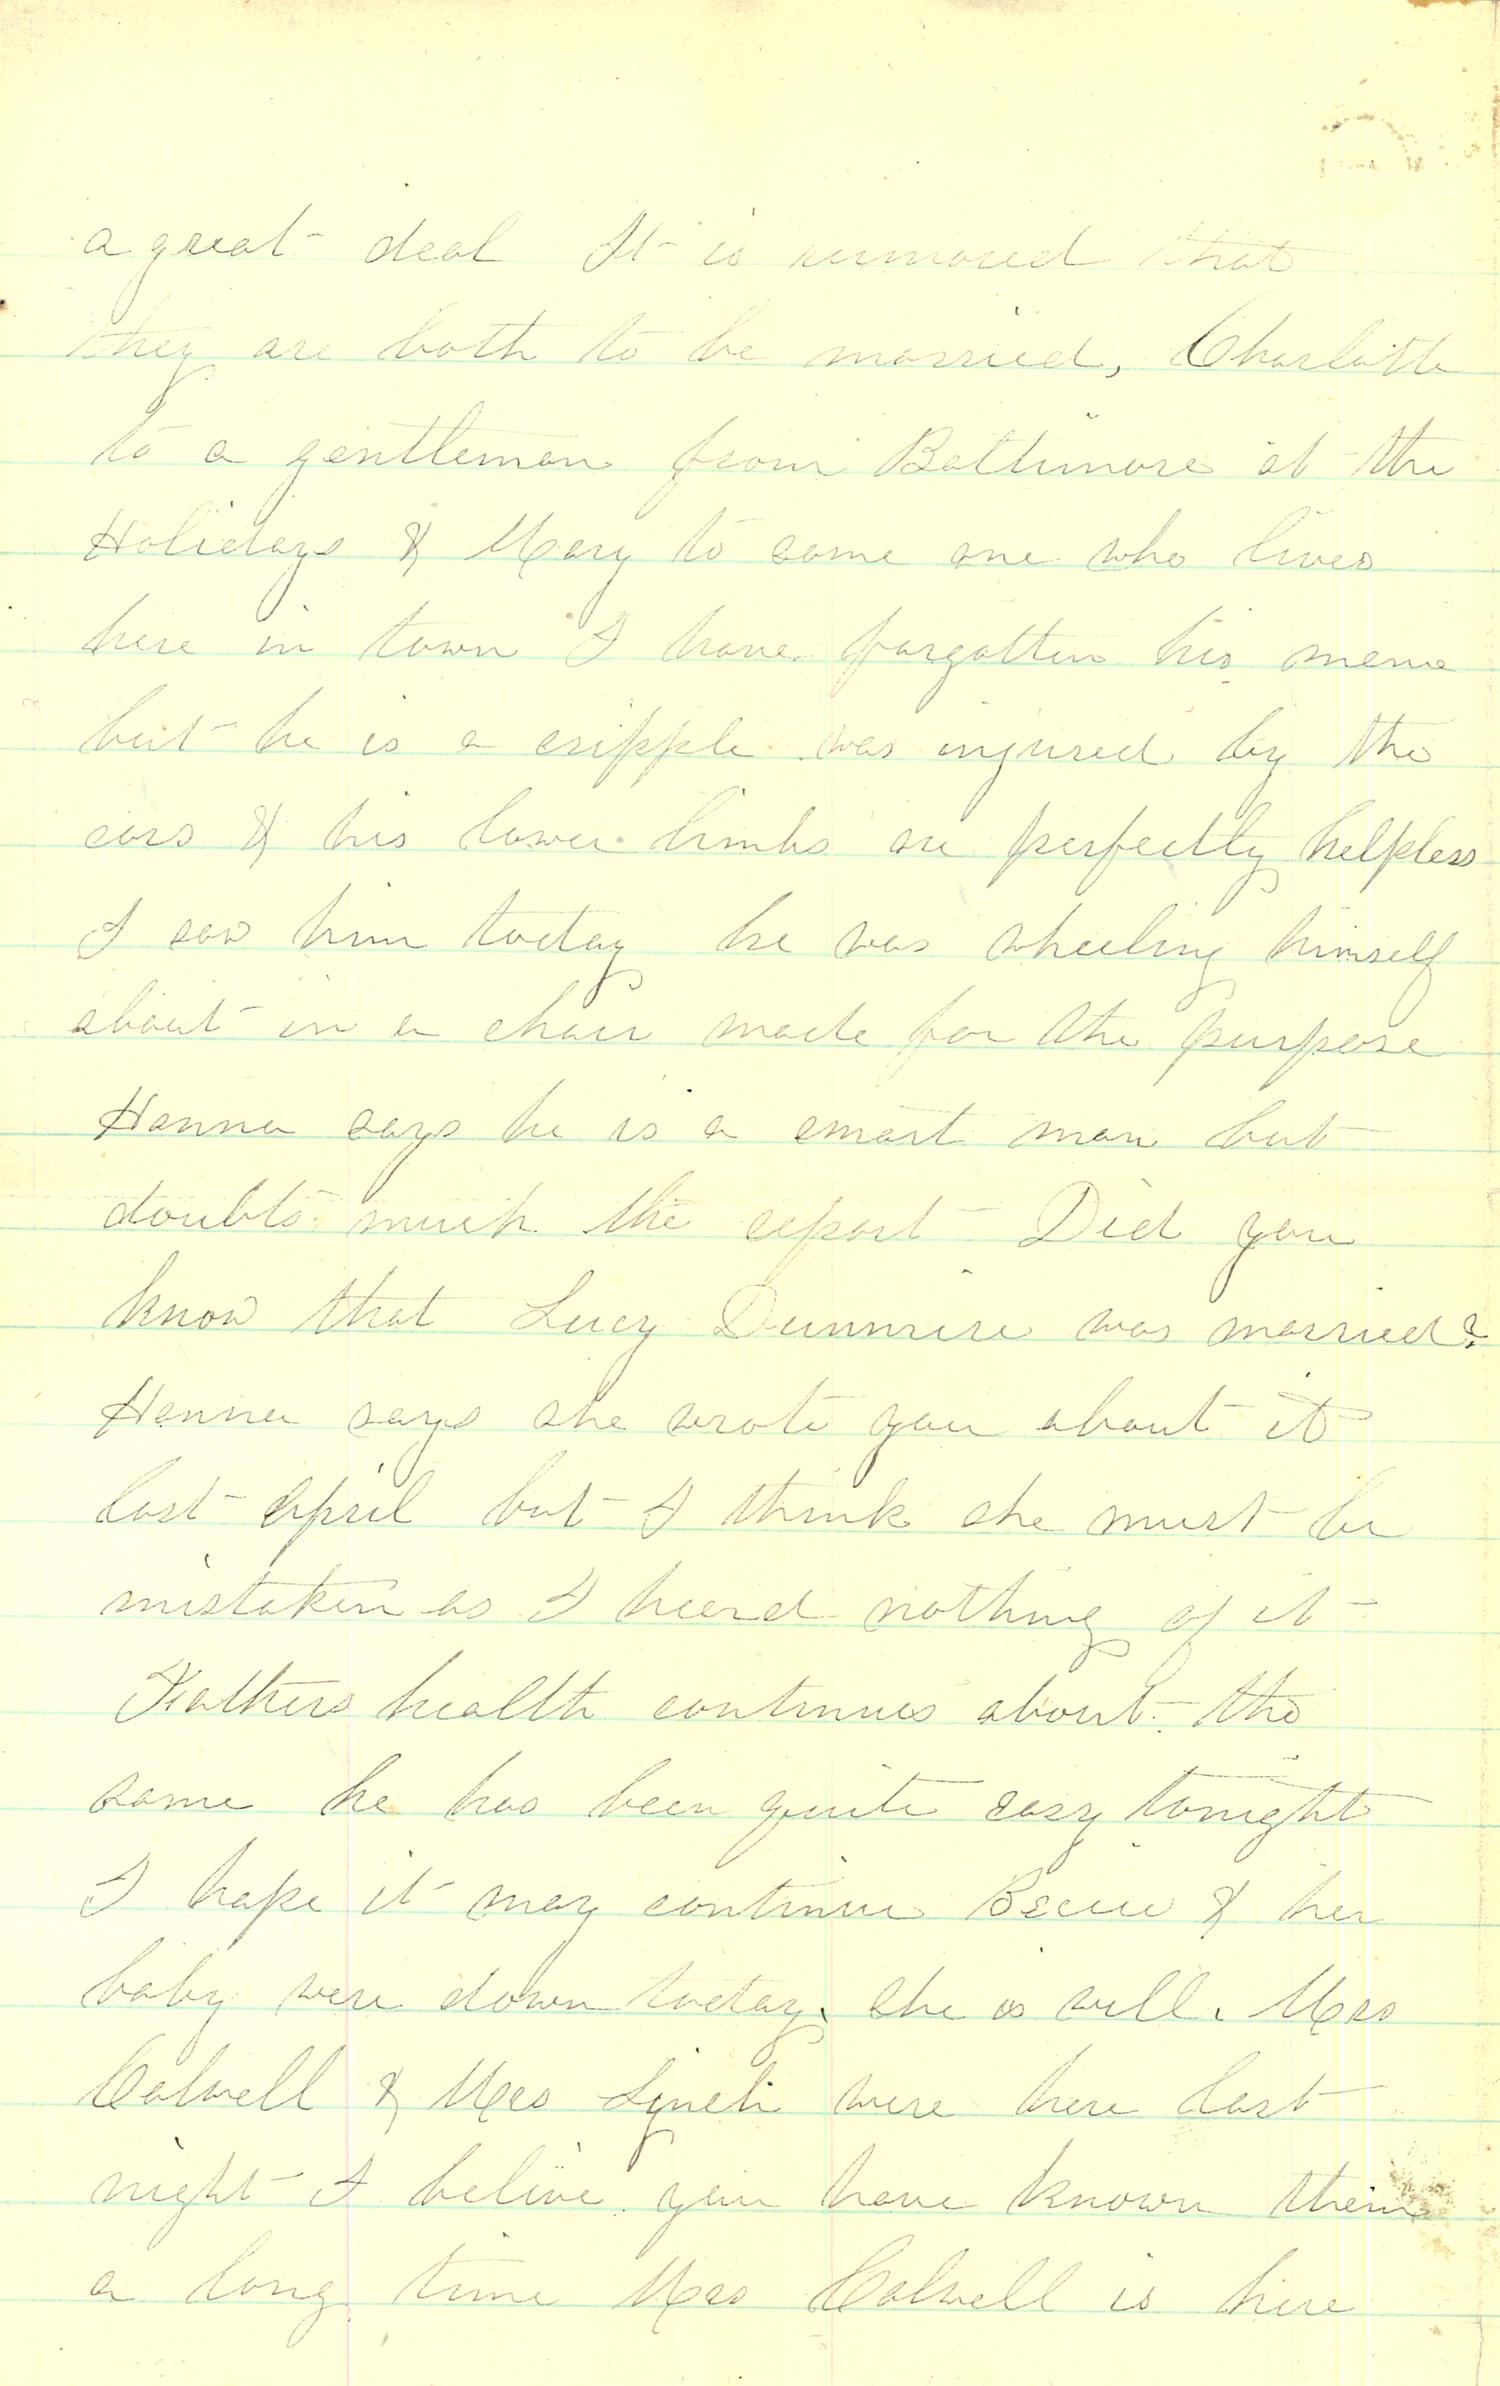 Joseph Culver Letter, September 6, 1863, Page 2